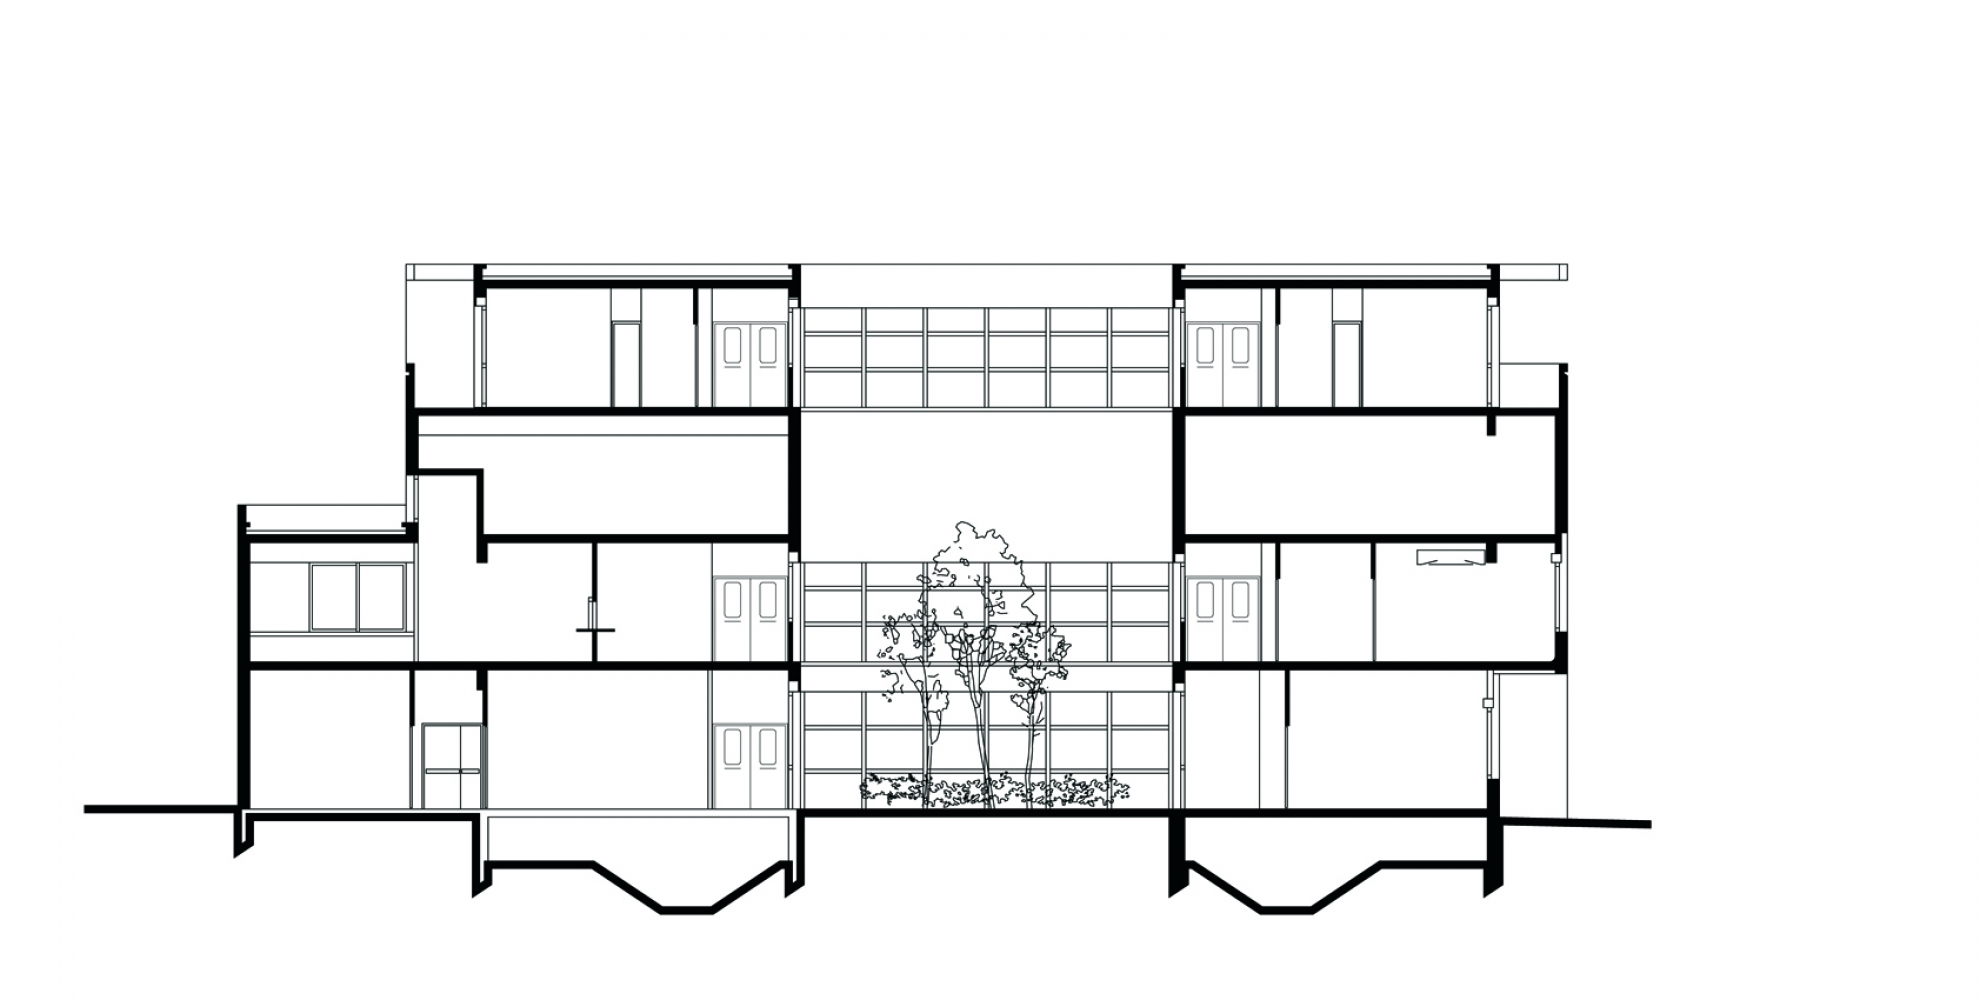 chr--05 Pascale SEURIN Architecte - Pascale SEURIN Architecte